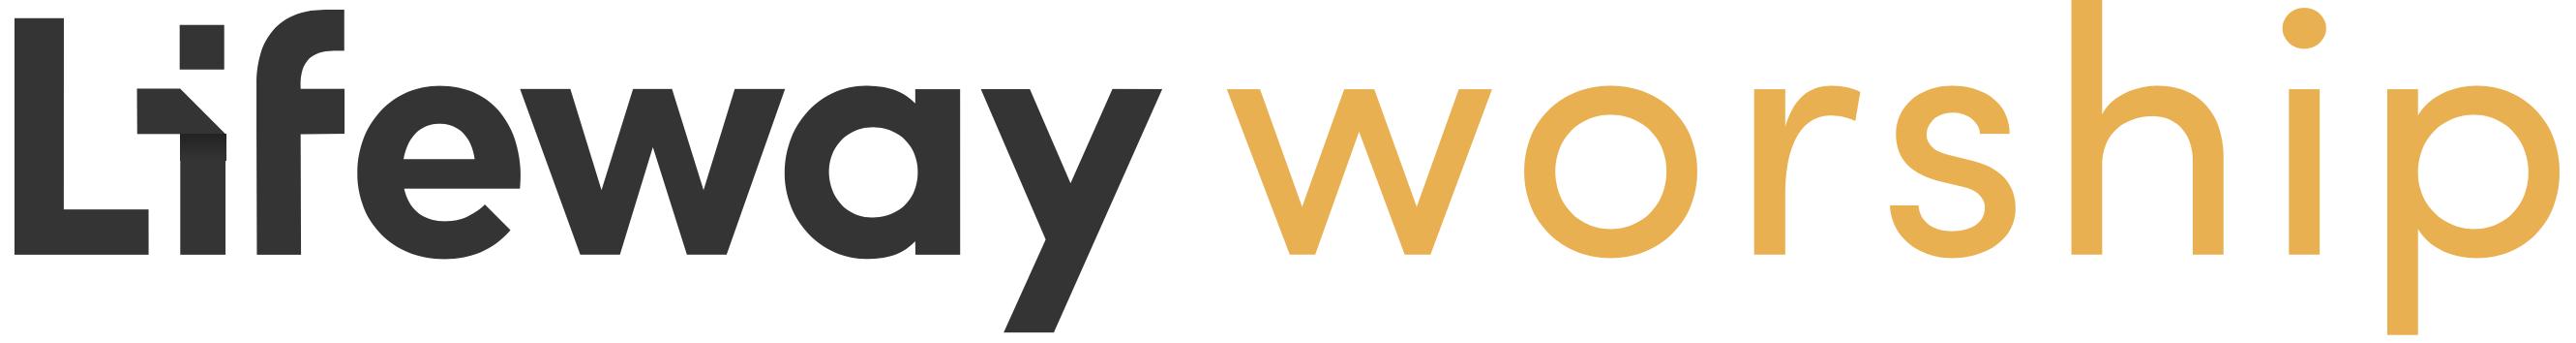 LifeWay Worship - MyWorship Home